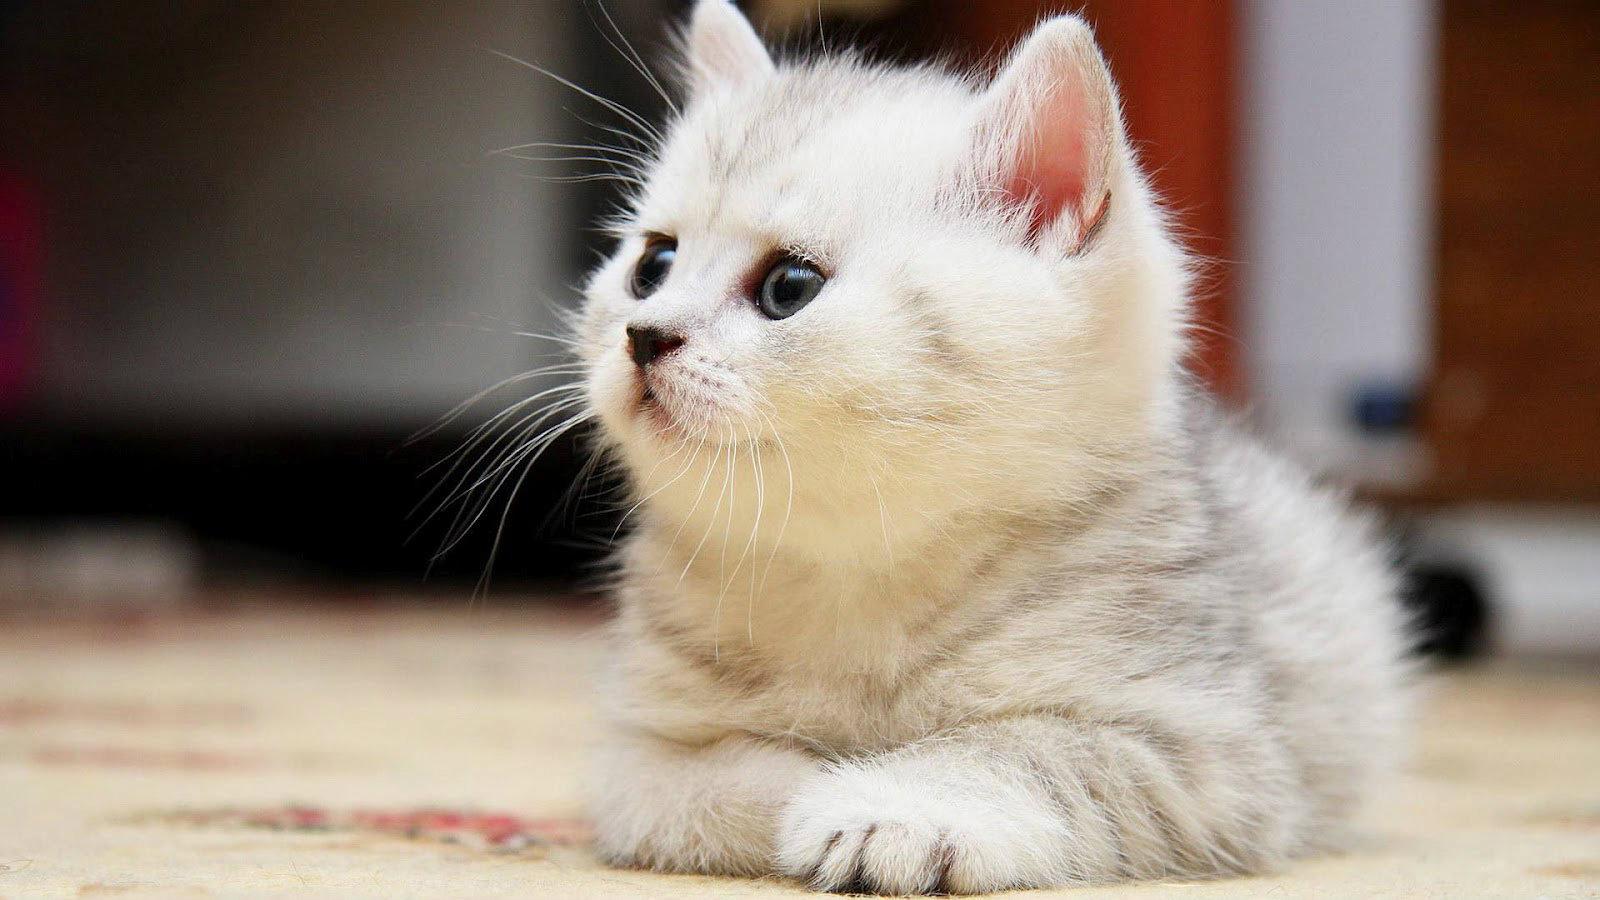 بالصور قطط وكلاب , صور اجمل قطط وكلاب اليفه وكيوت 4241 2